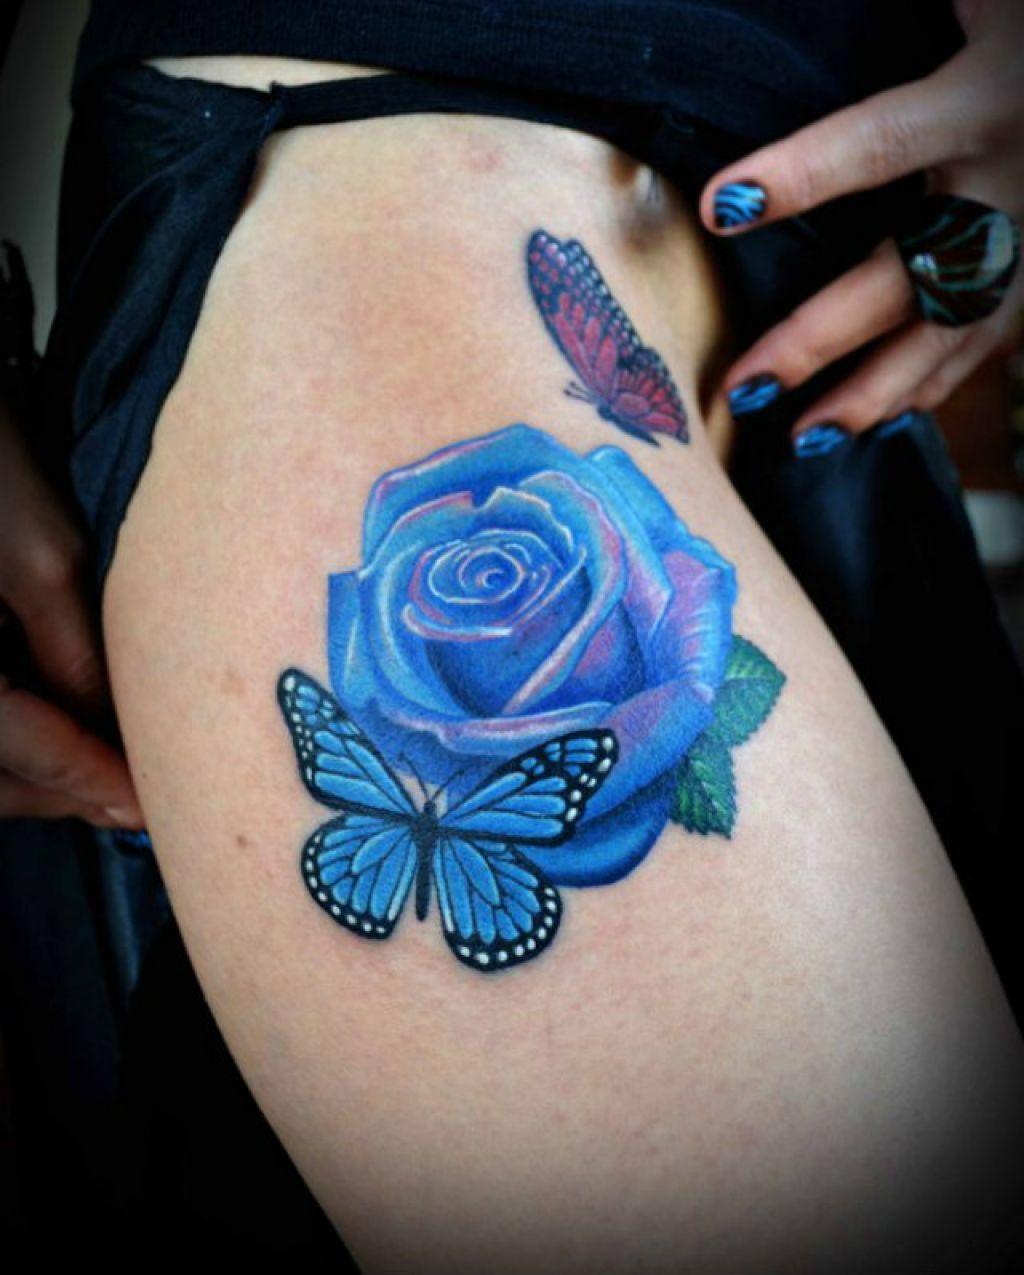 Butterfly Tattoos Designs On Hip – Body Tattoo Art | Tattoos